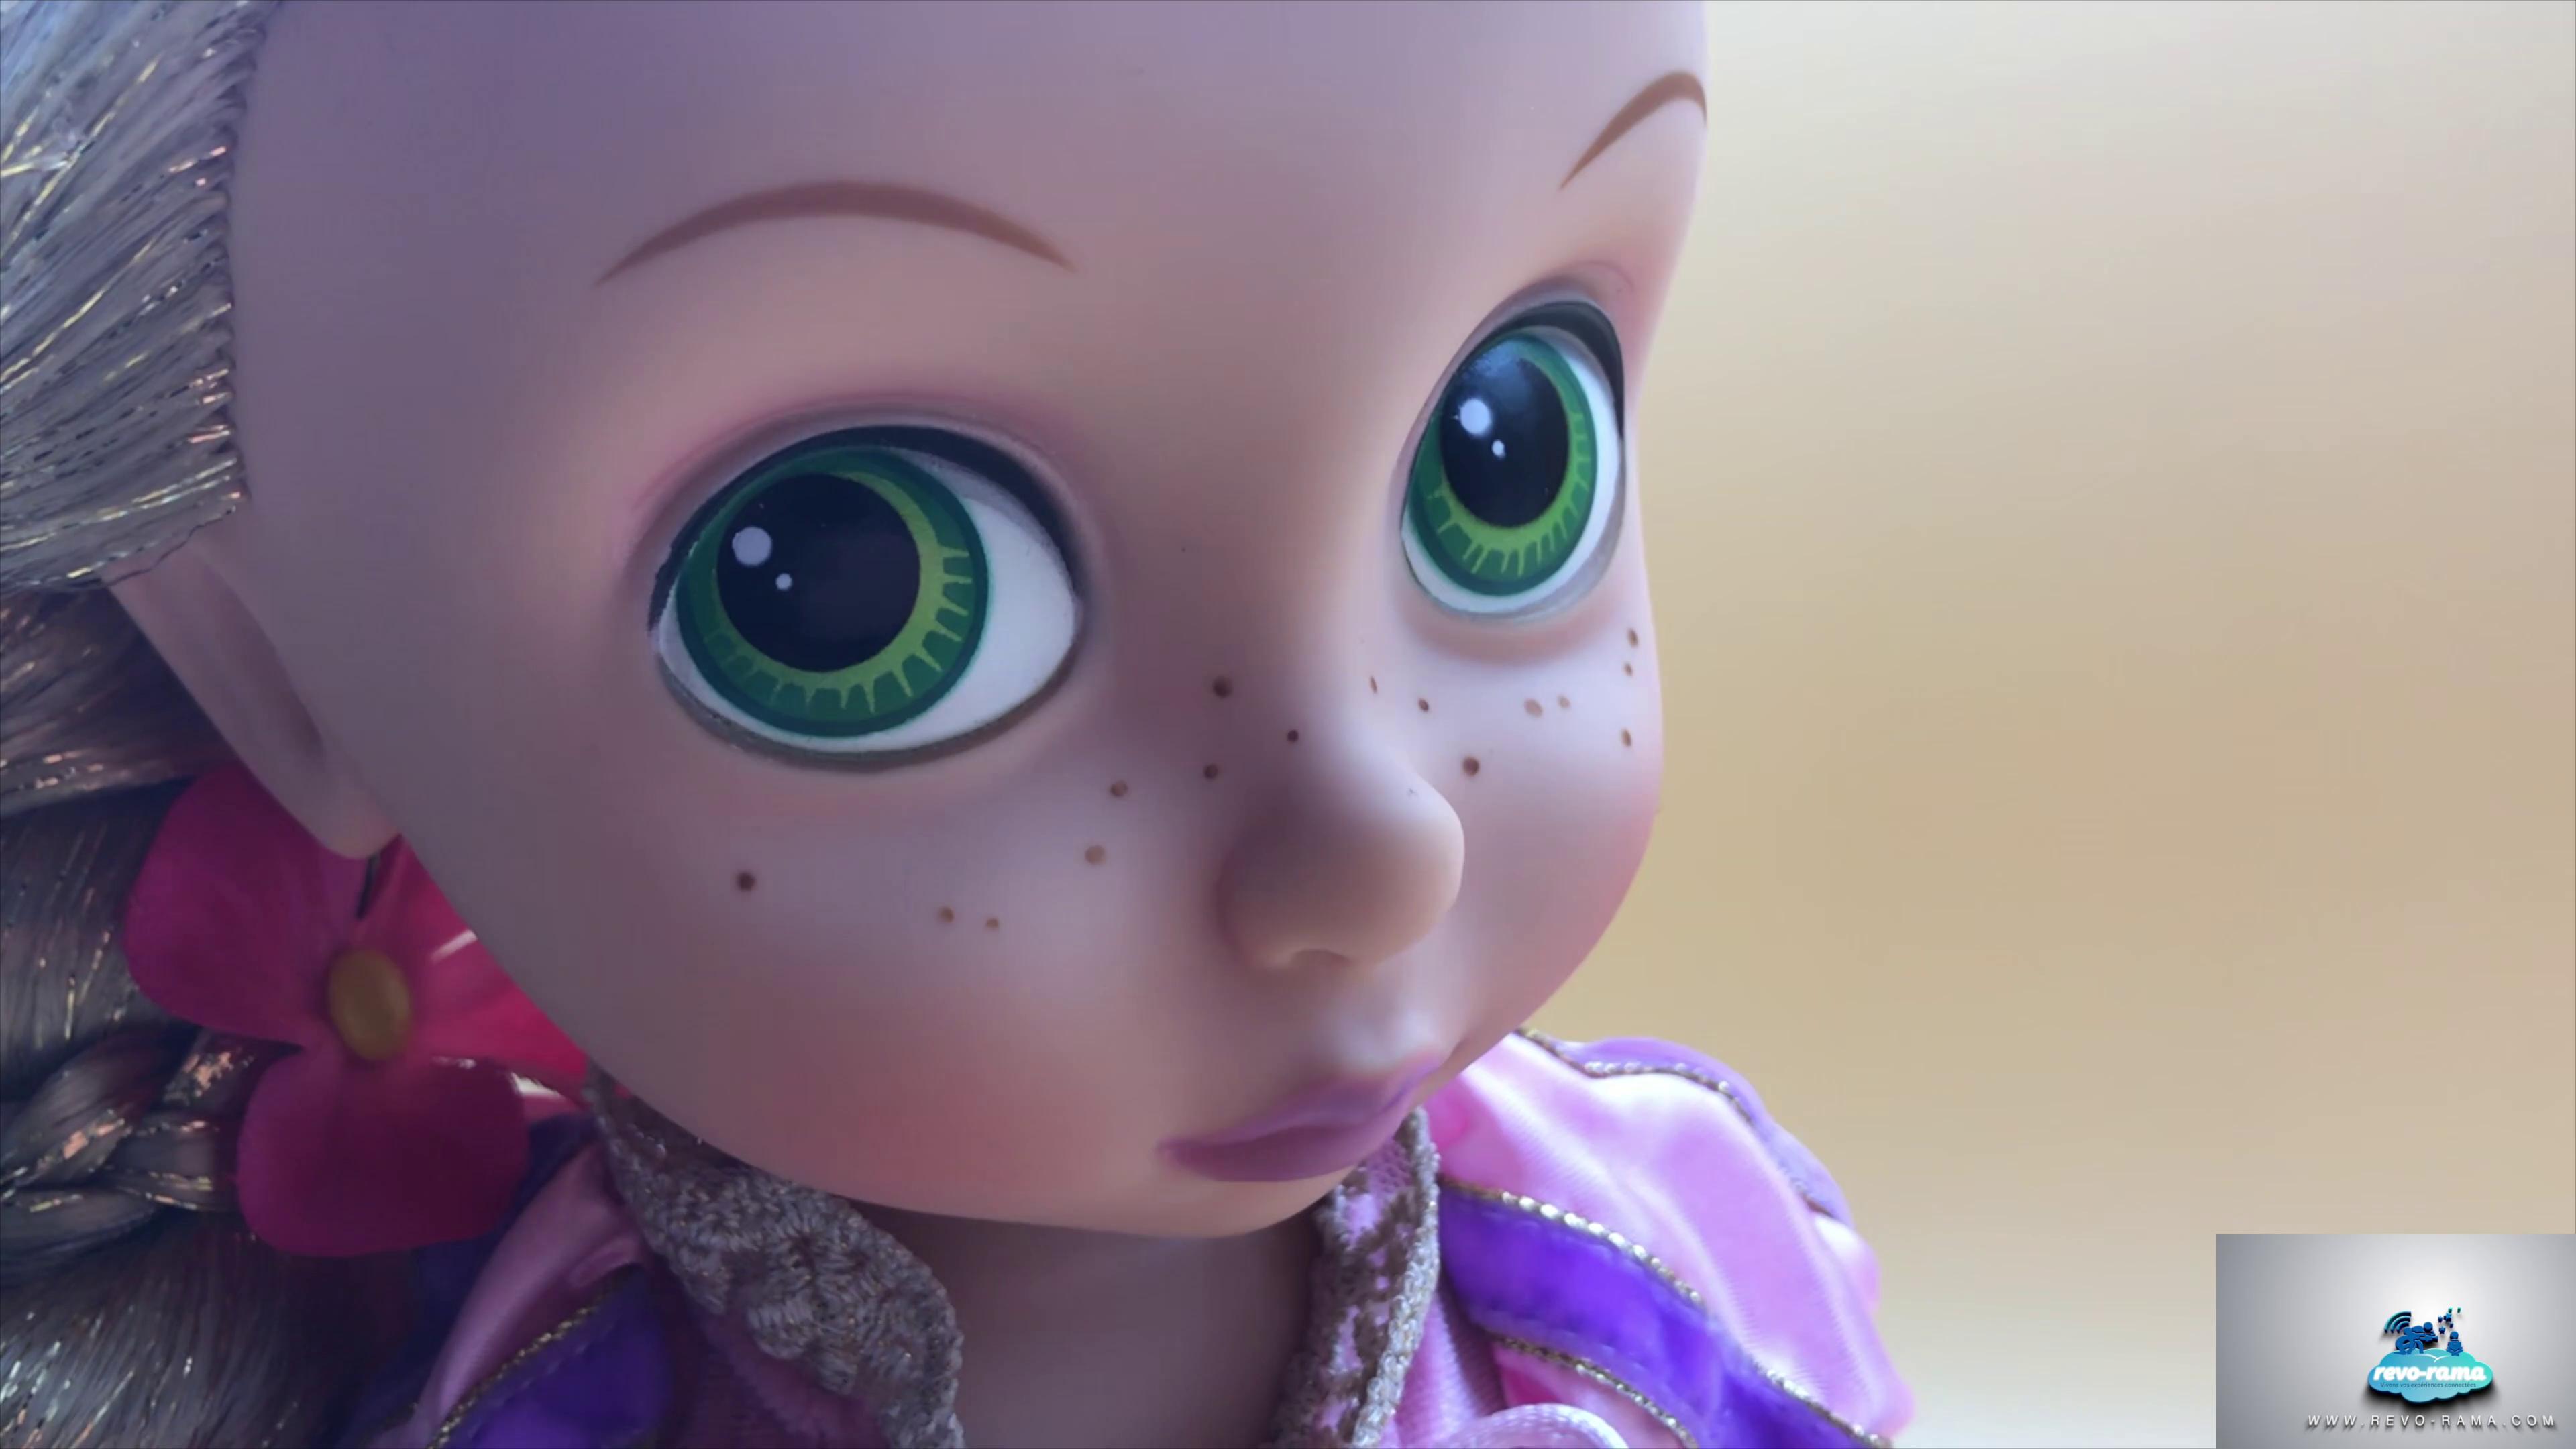 revo-rama-poupees-dolls-disney-animator-classic-speciales-collector-attractionistas-2018